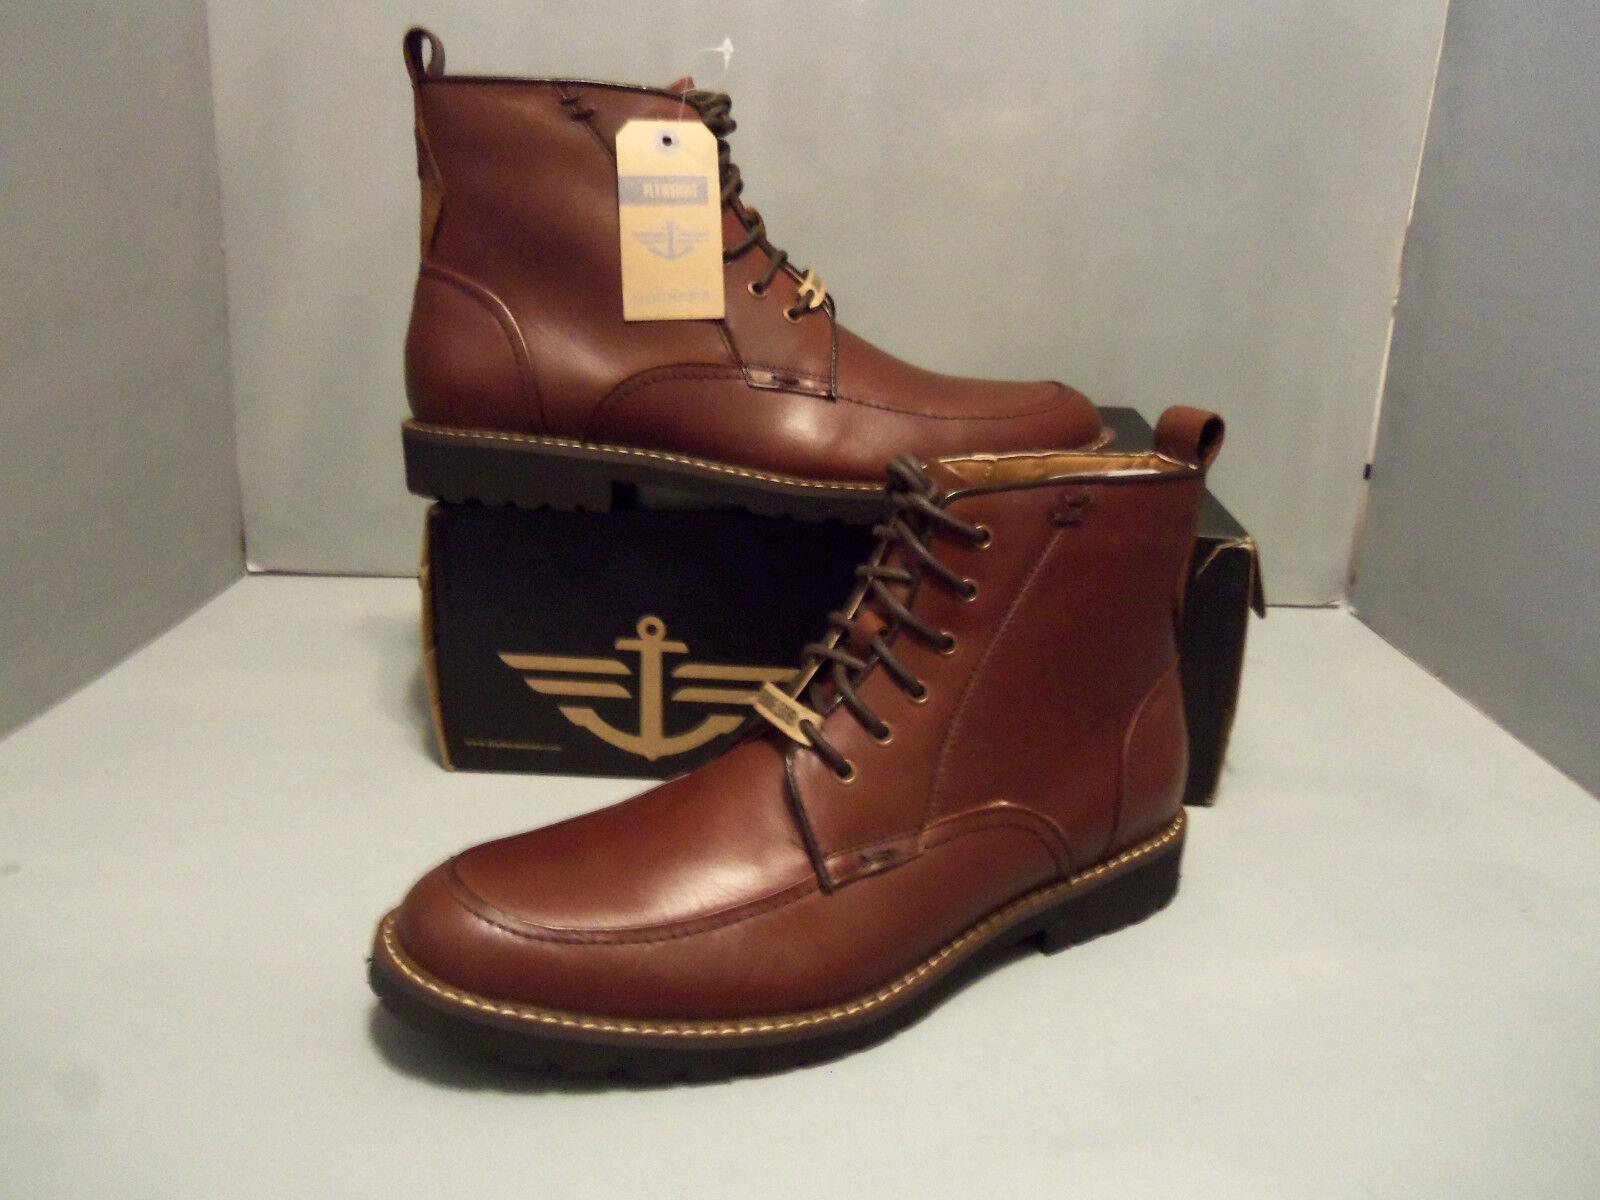 Dockers Mens Brown Hi Boots Mercer Hartford Leather  Sizes  Handsome   style 3